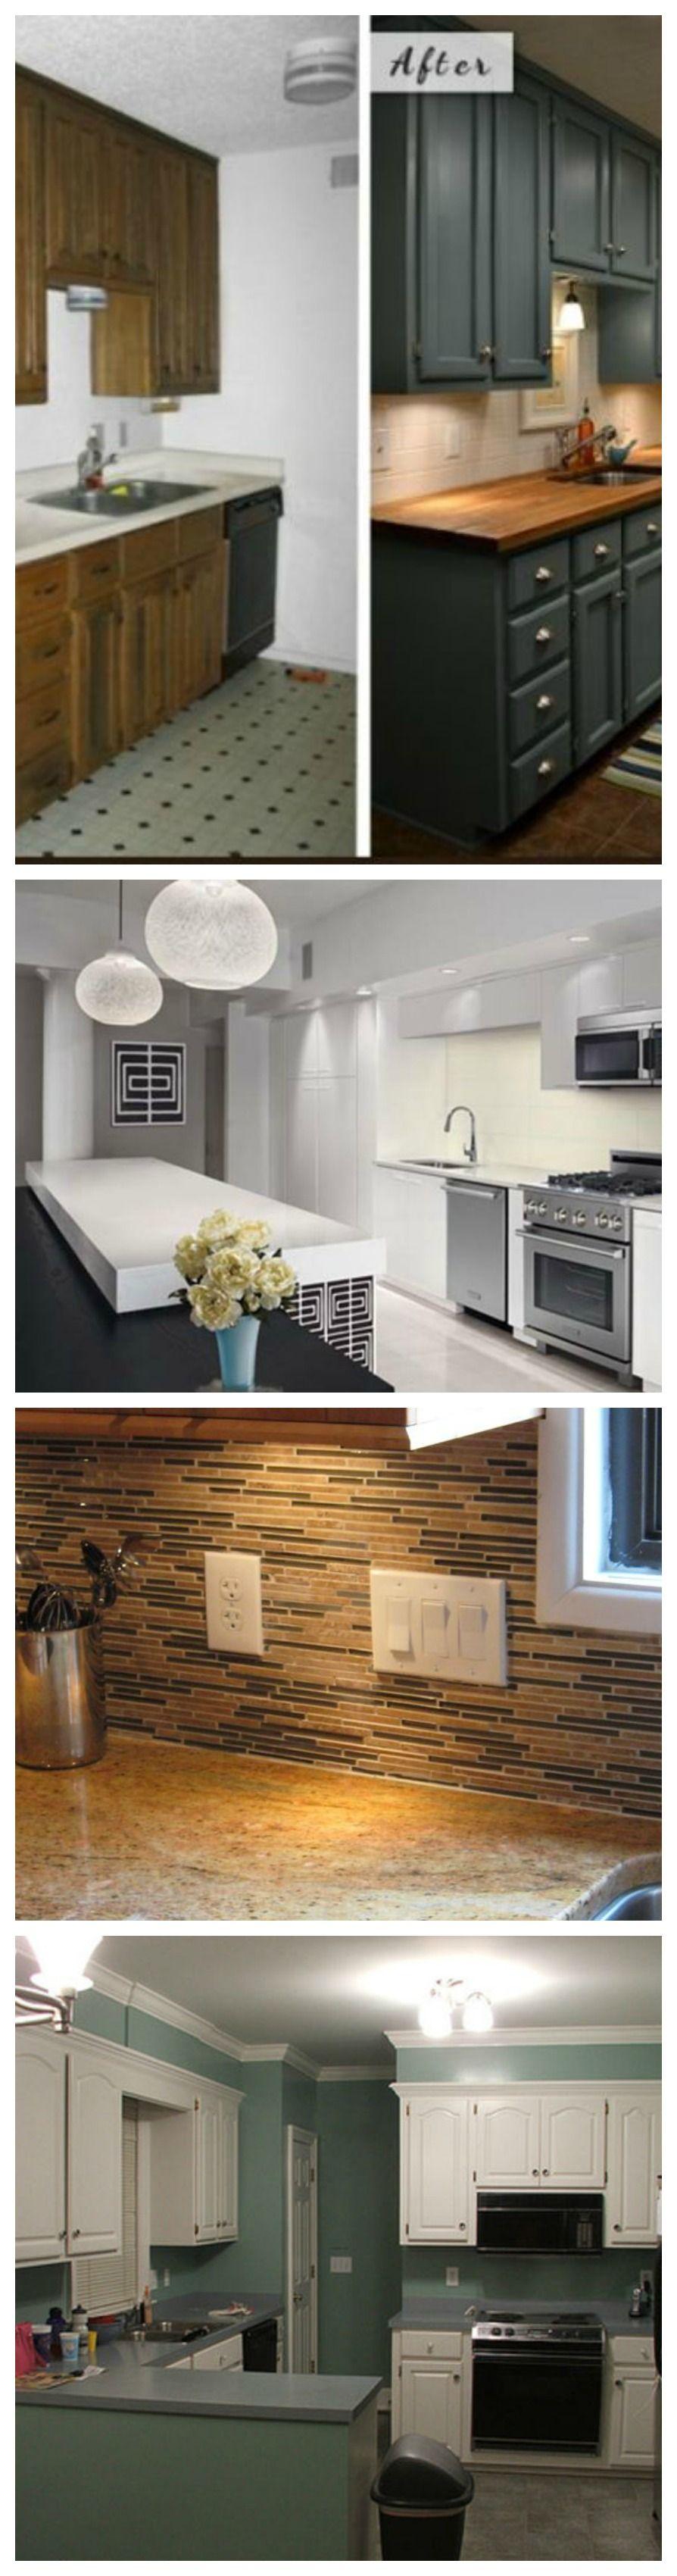 10 Cheap Renovation Ideas For Your Kitchen Diy Kitchen